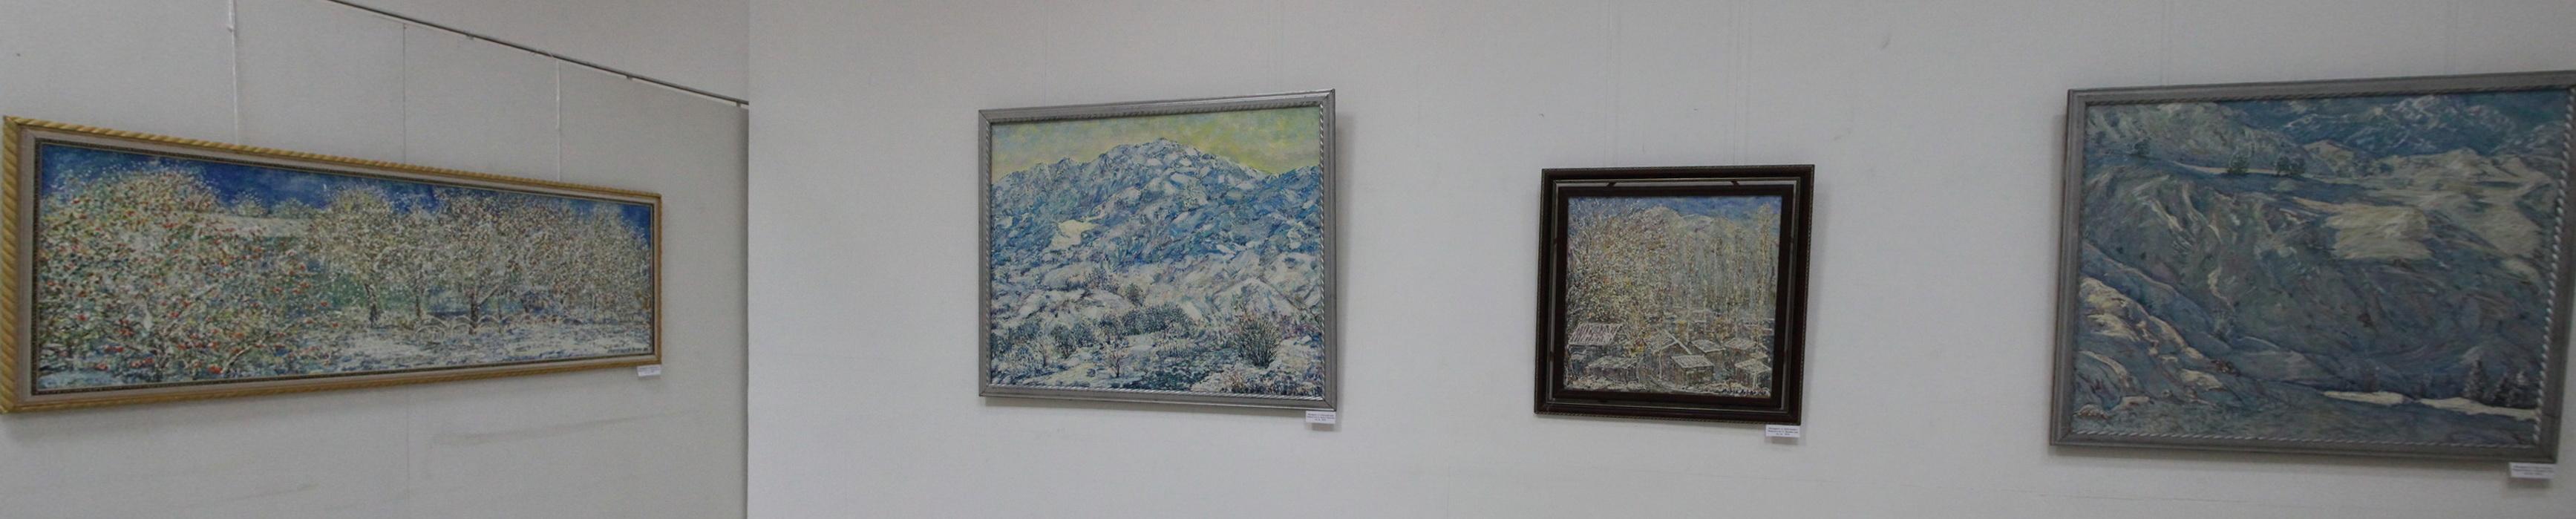 Мирсагатов Анвар. Экспозиция картин.